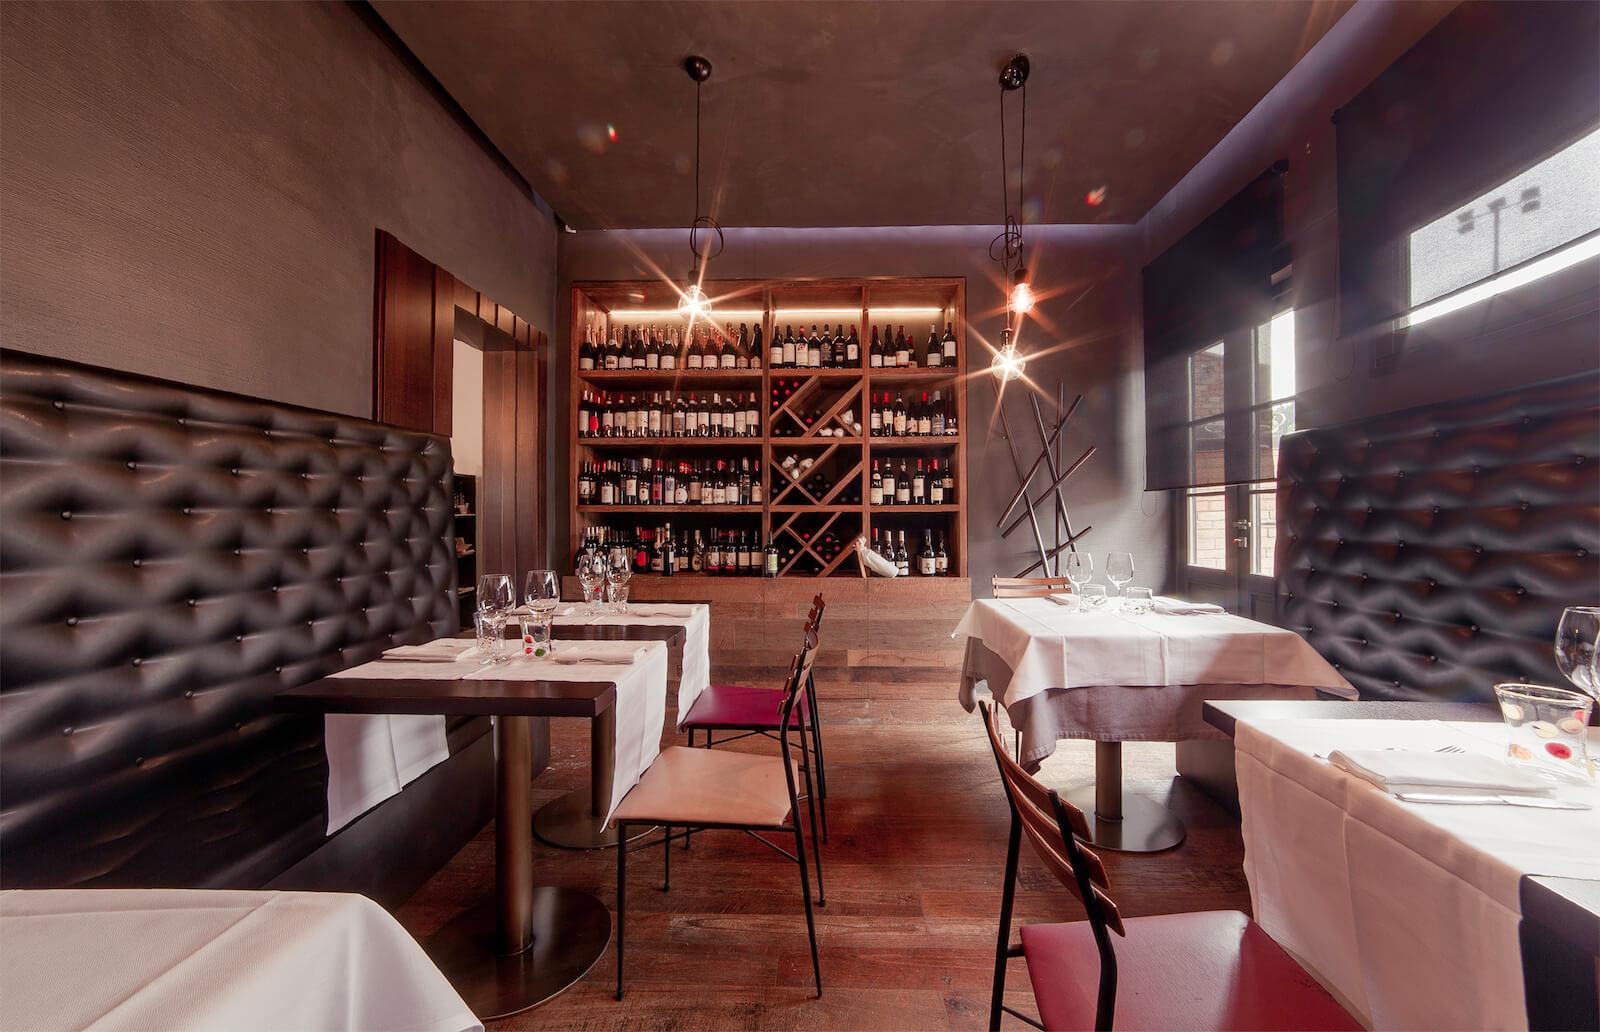 papaveri_e_papere_ristorante_san_miniato_16ee-23